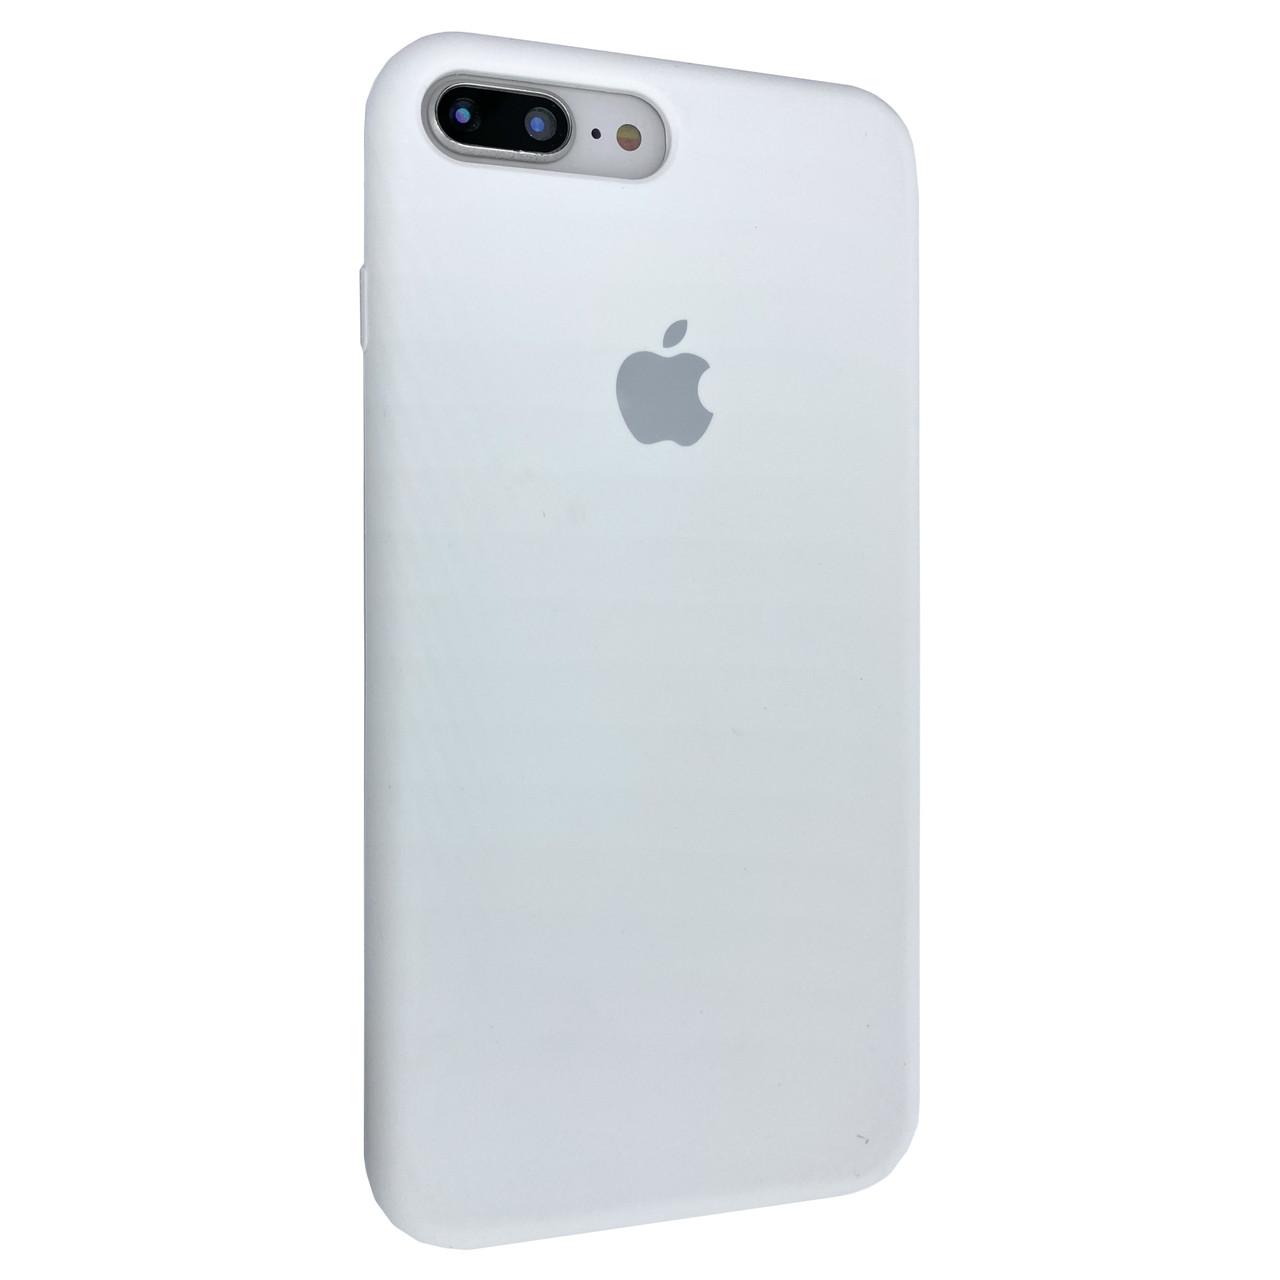 Чехол-накладка Silicone Case Full Cover для Apple iPhone 7 / 8 Plus (white)